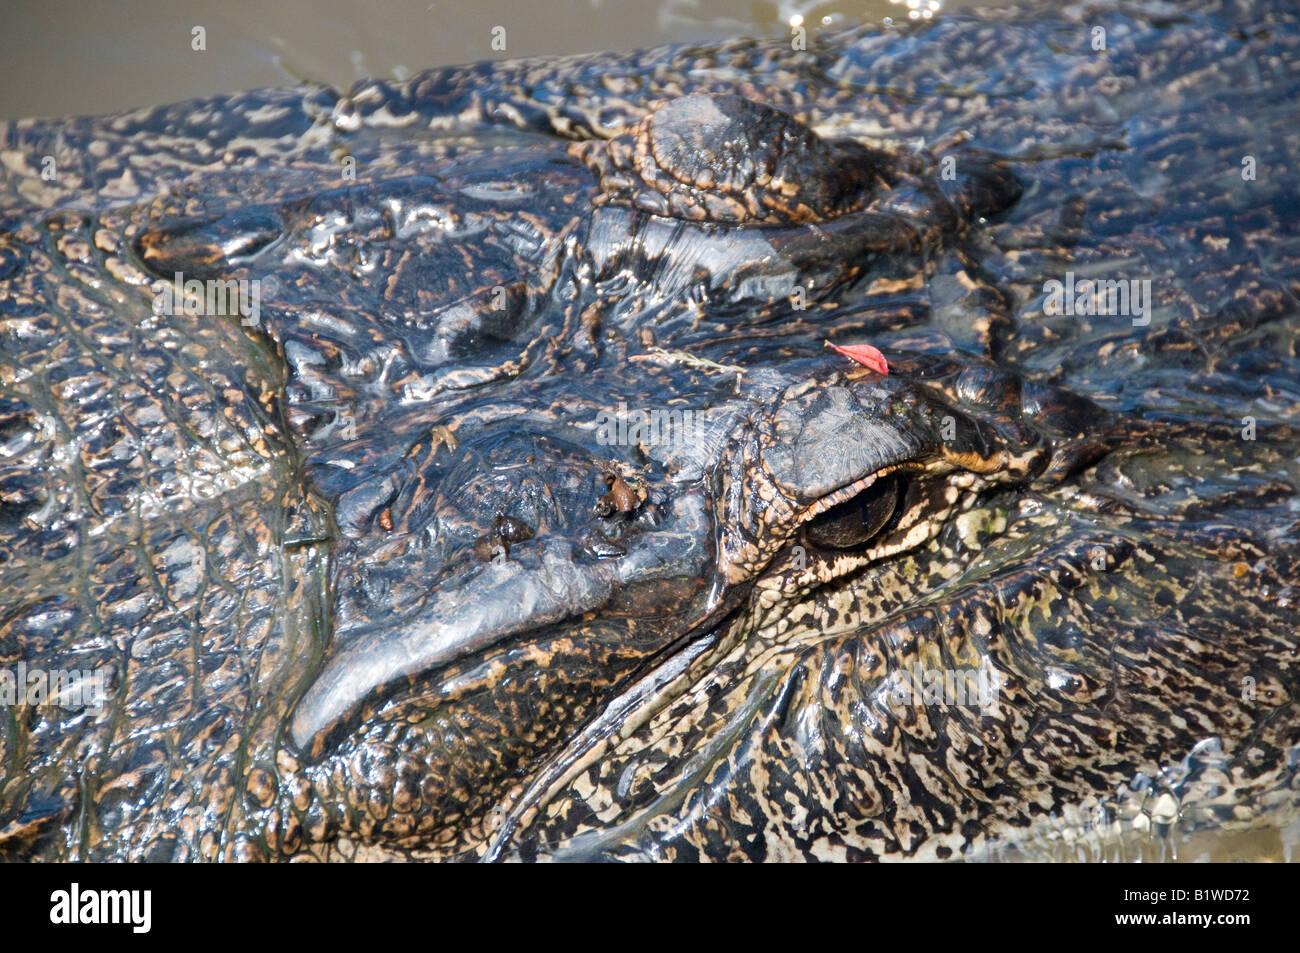 Alligator (alligator mississippiensis), Honey Island Swamp, West Pearl River, Saint Tammany Parish, Northshore, Louisiana. Stock Photo